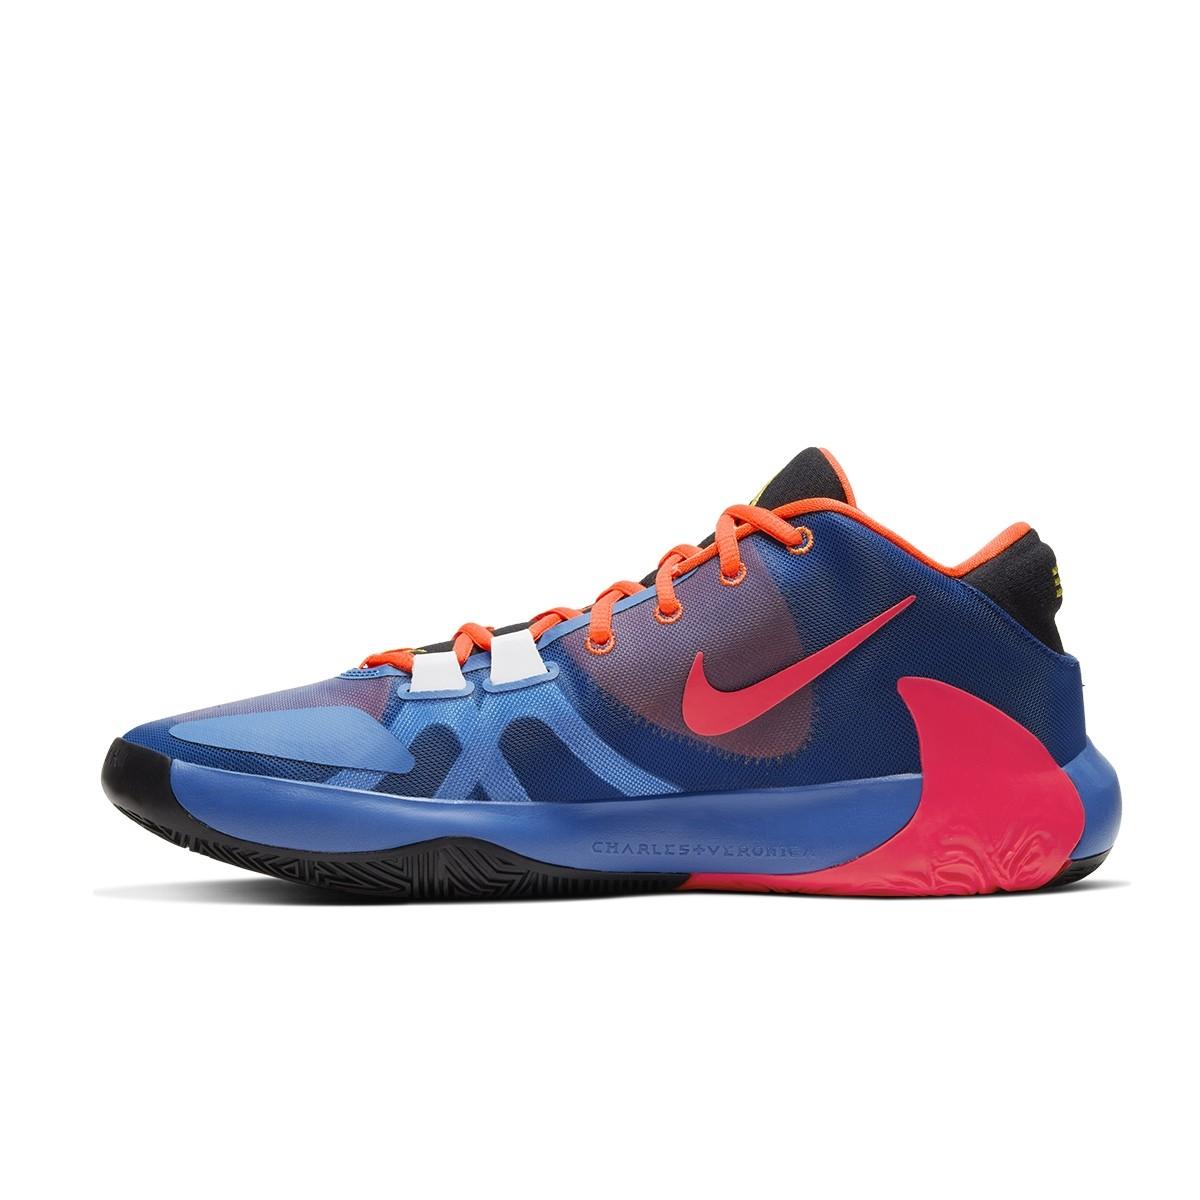 Nike Zoom Freak 1 'Multicolor'-CT8476-800